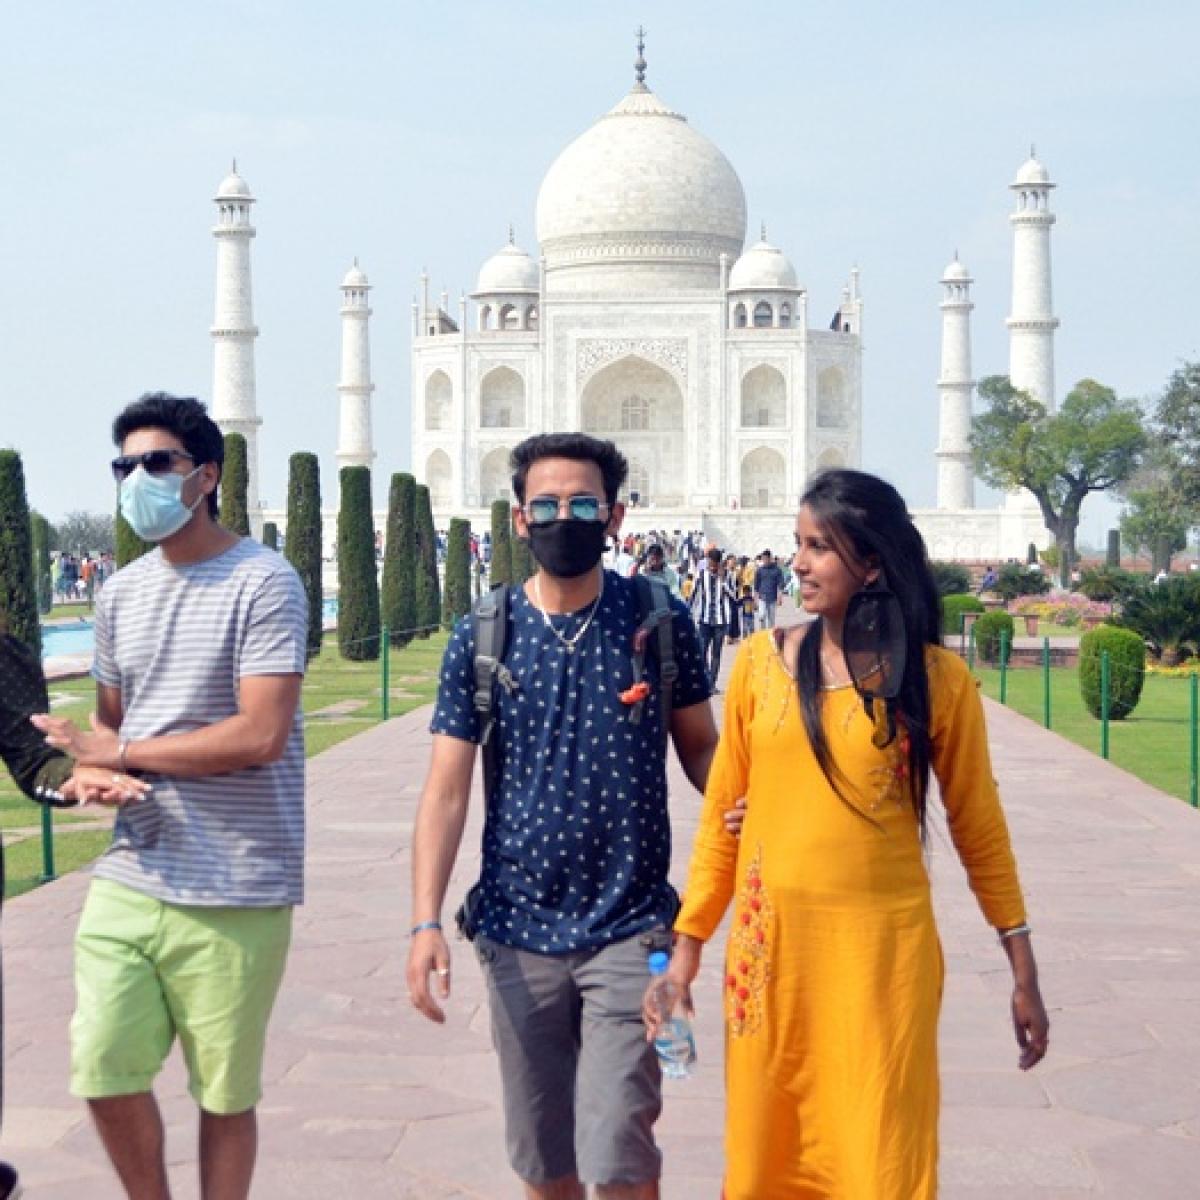 Latest coronavirus update: Taj Mahal closed for visitors from today amid virus scare